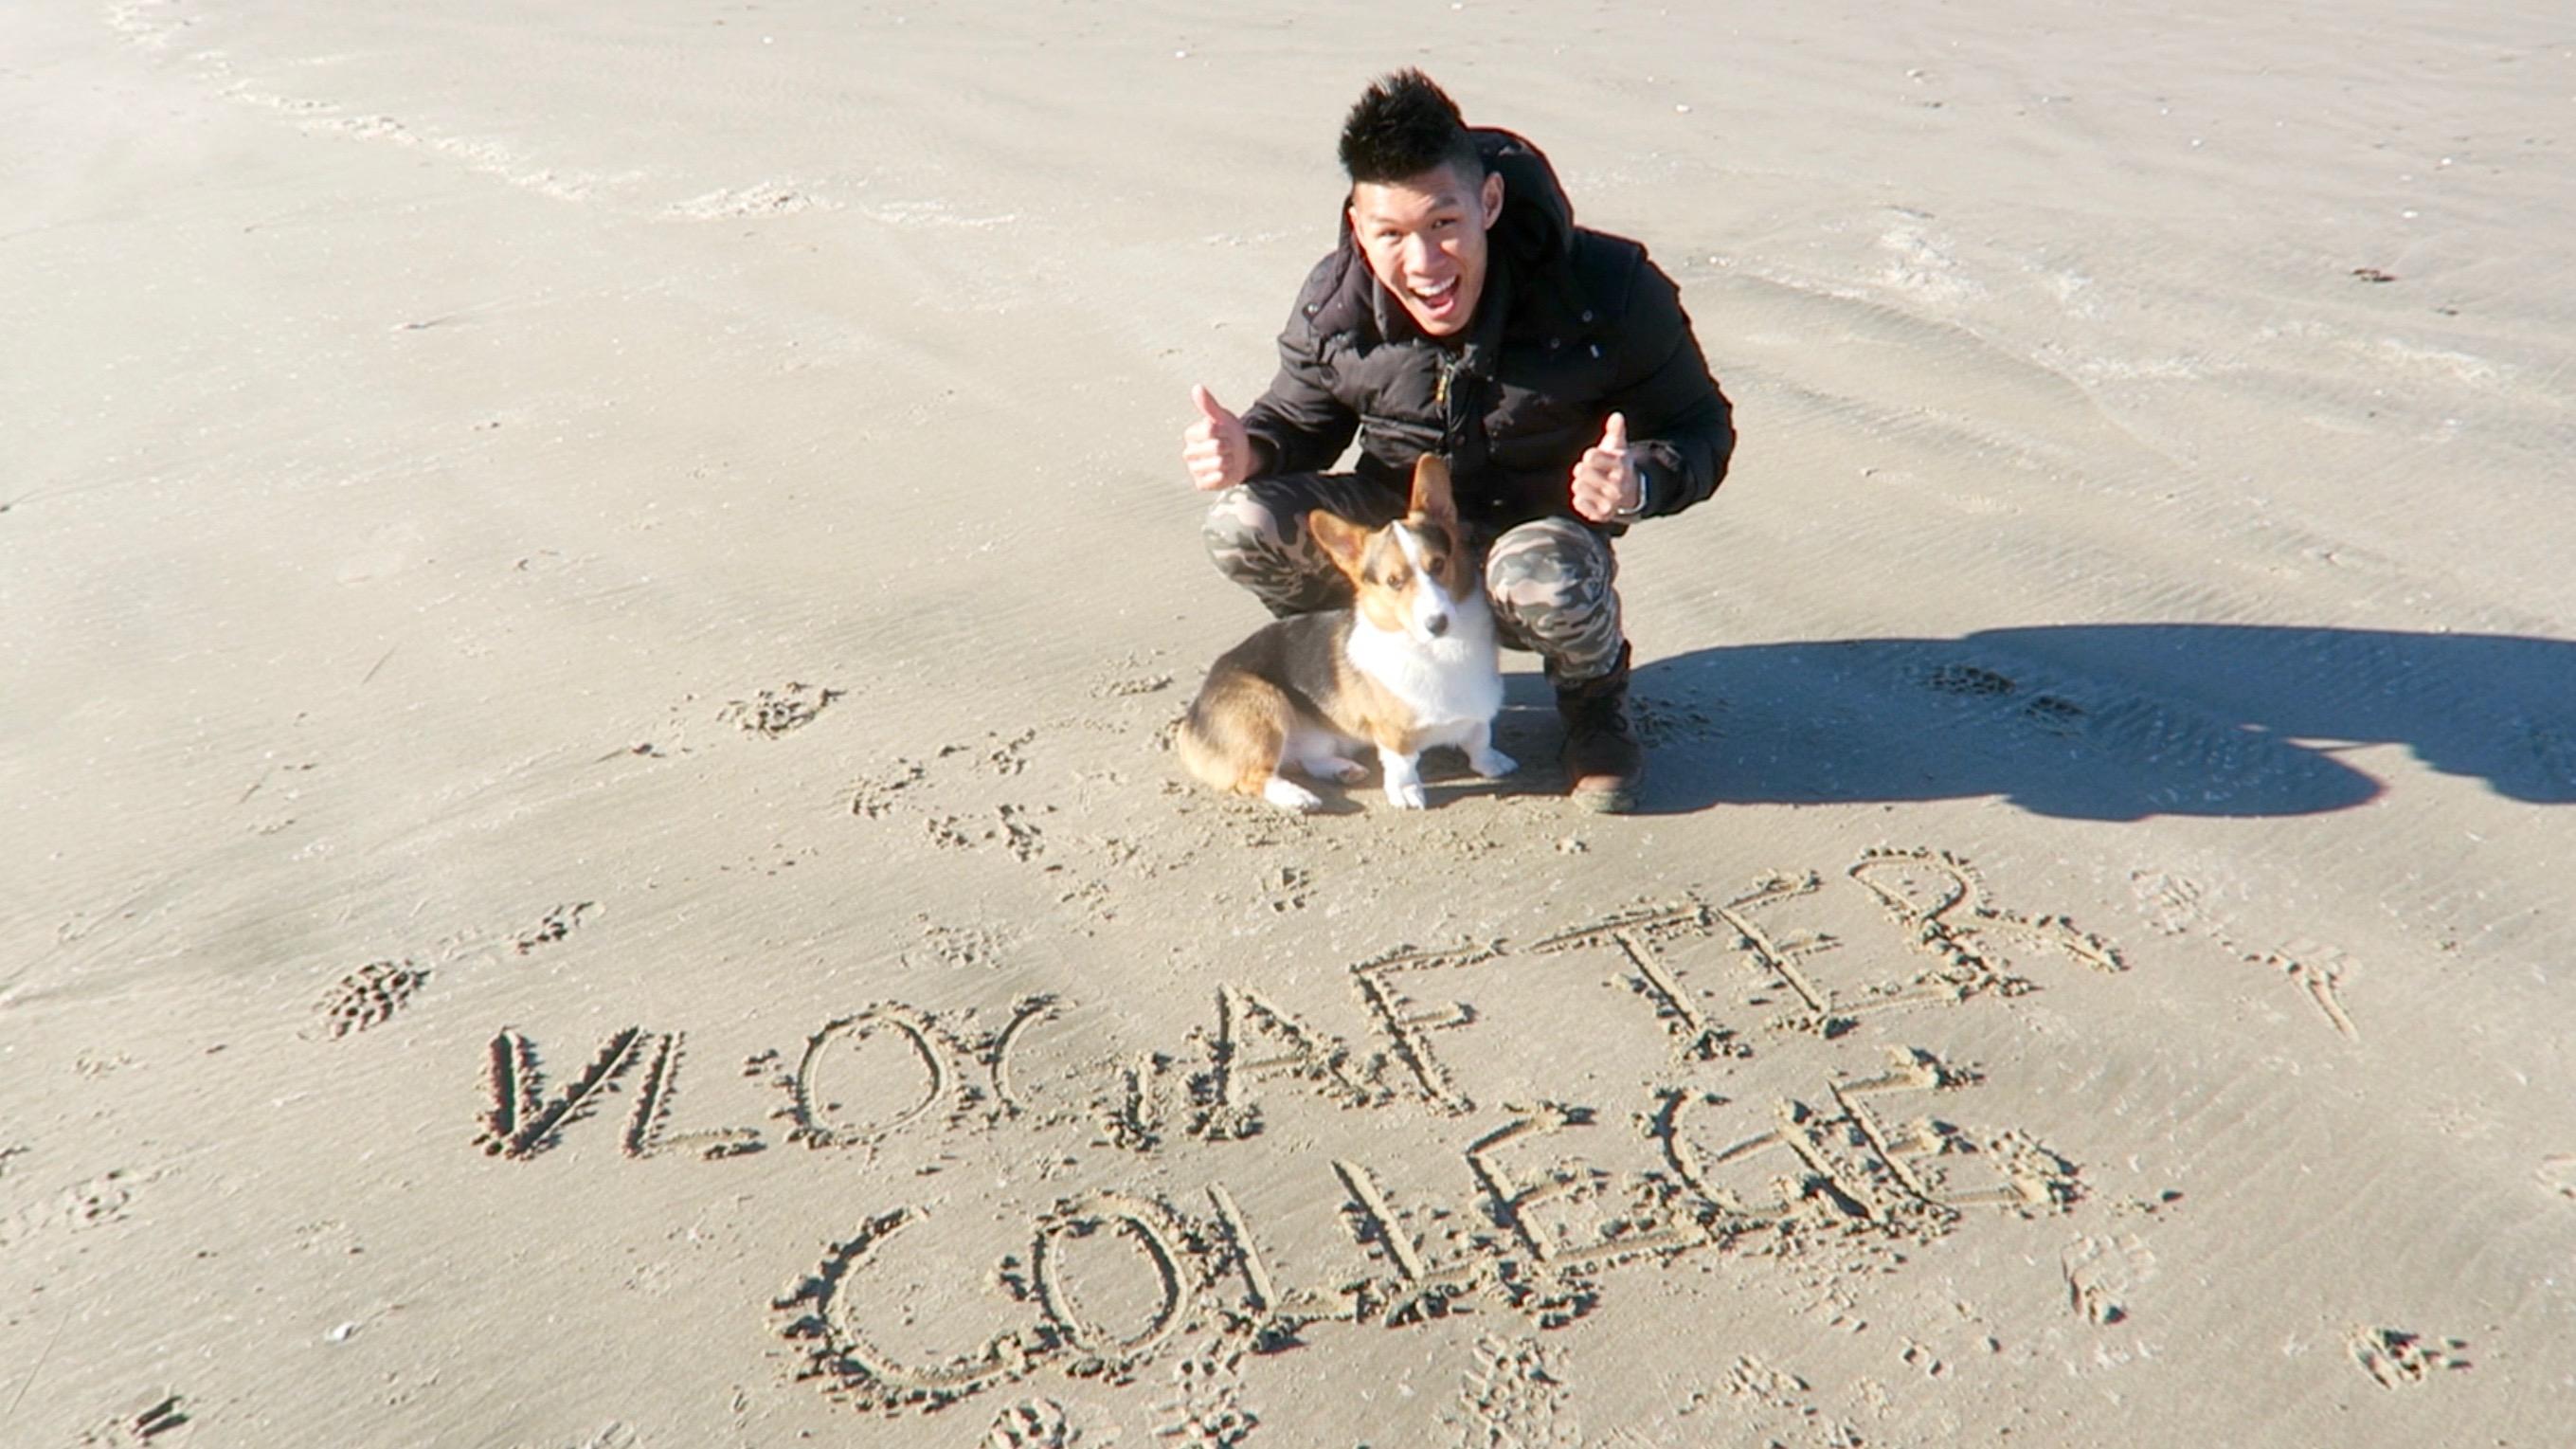 DOG'S HAPPIEST LIFE MOMENT: CORGI HAS A BLAST ALONE ON BEACH